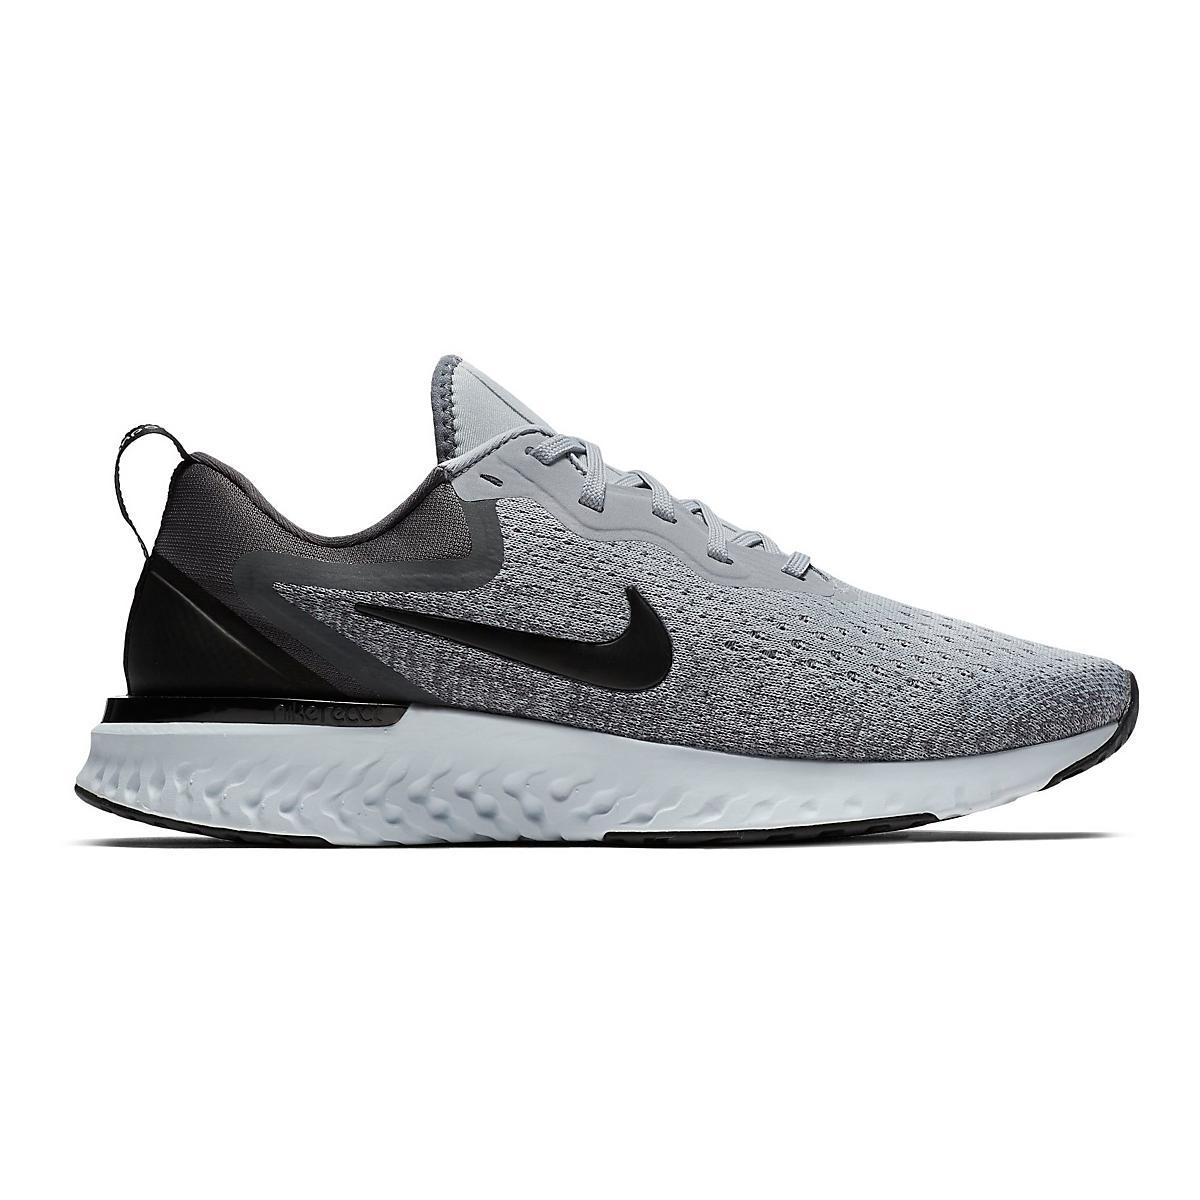 buy popular 04f2e de096 Womens Nike Odyssey React Running Shoe at Road Runner Sports